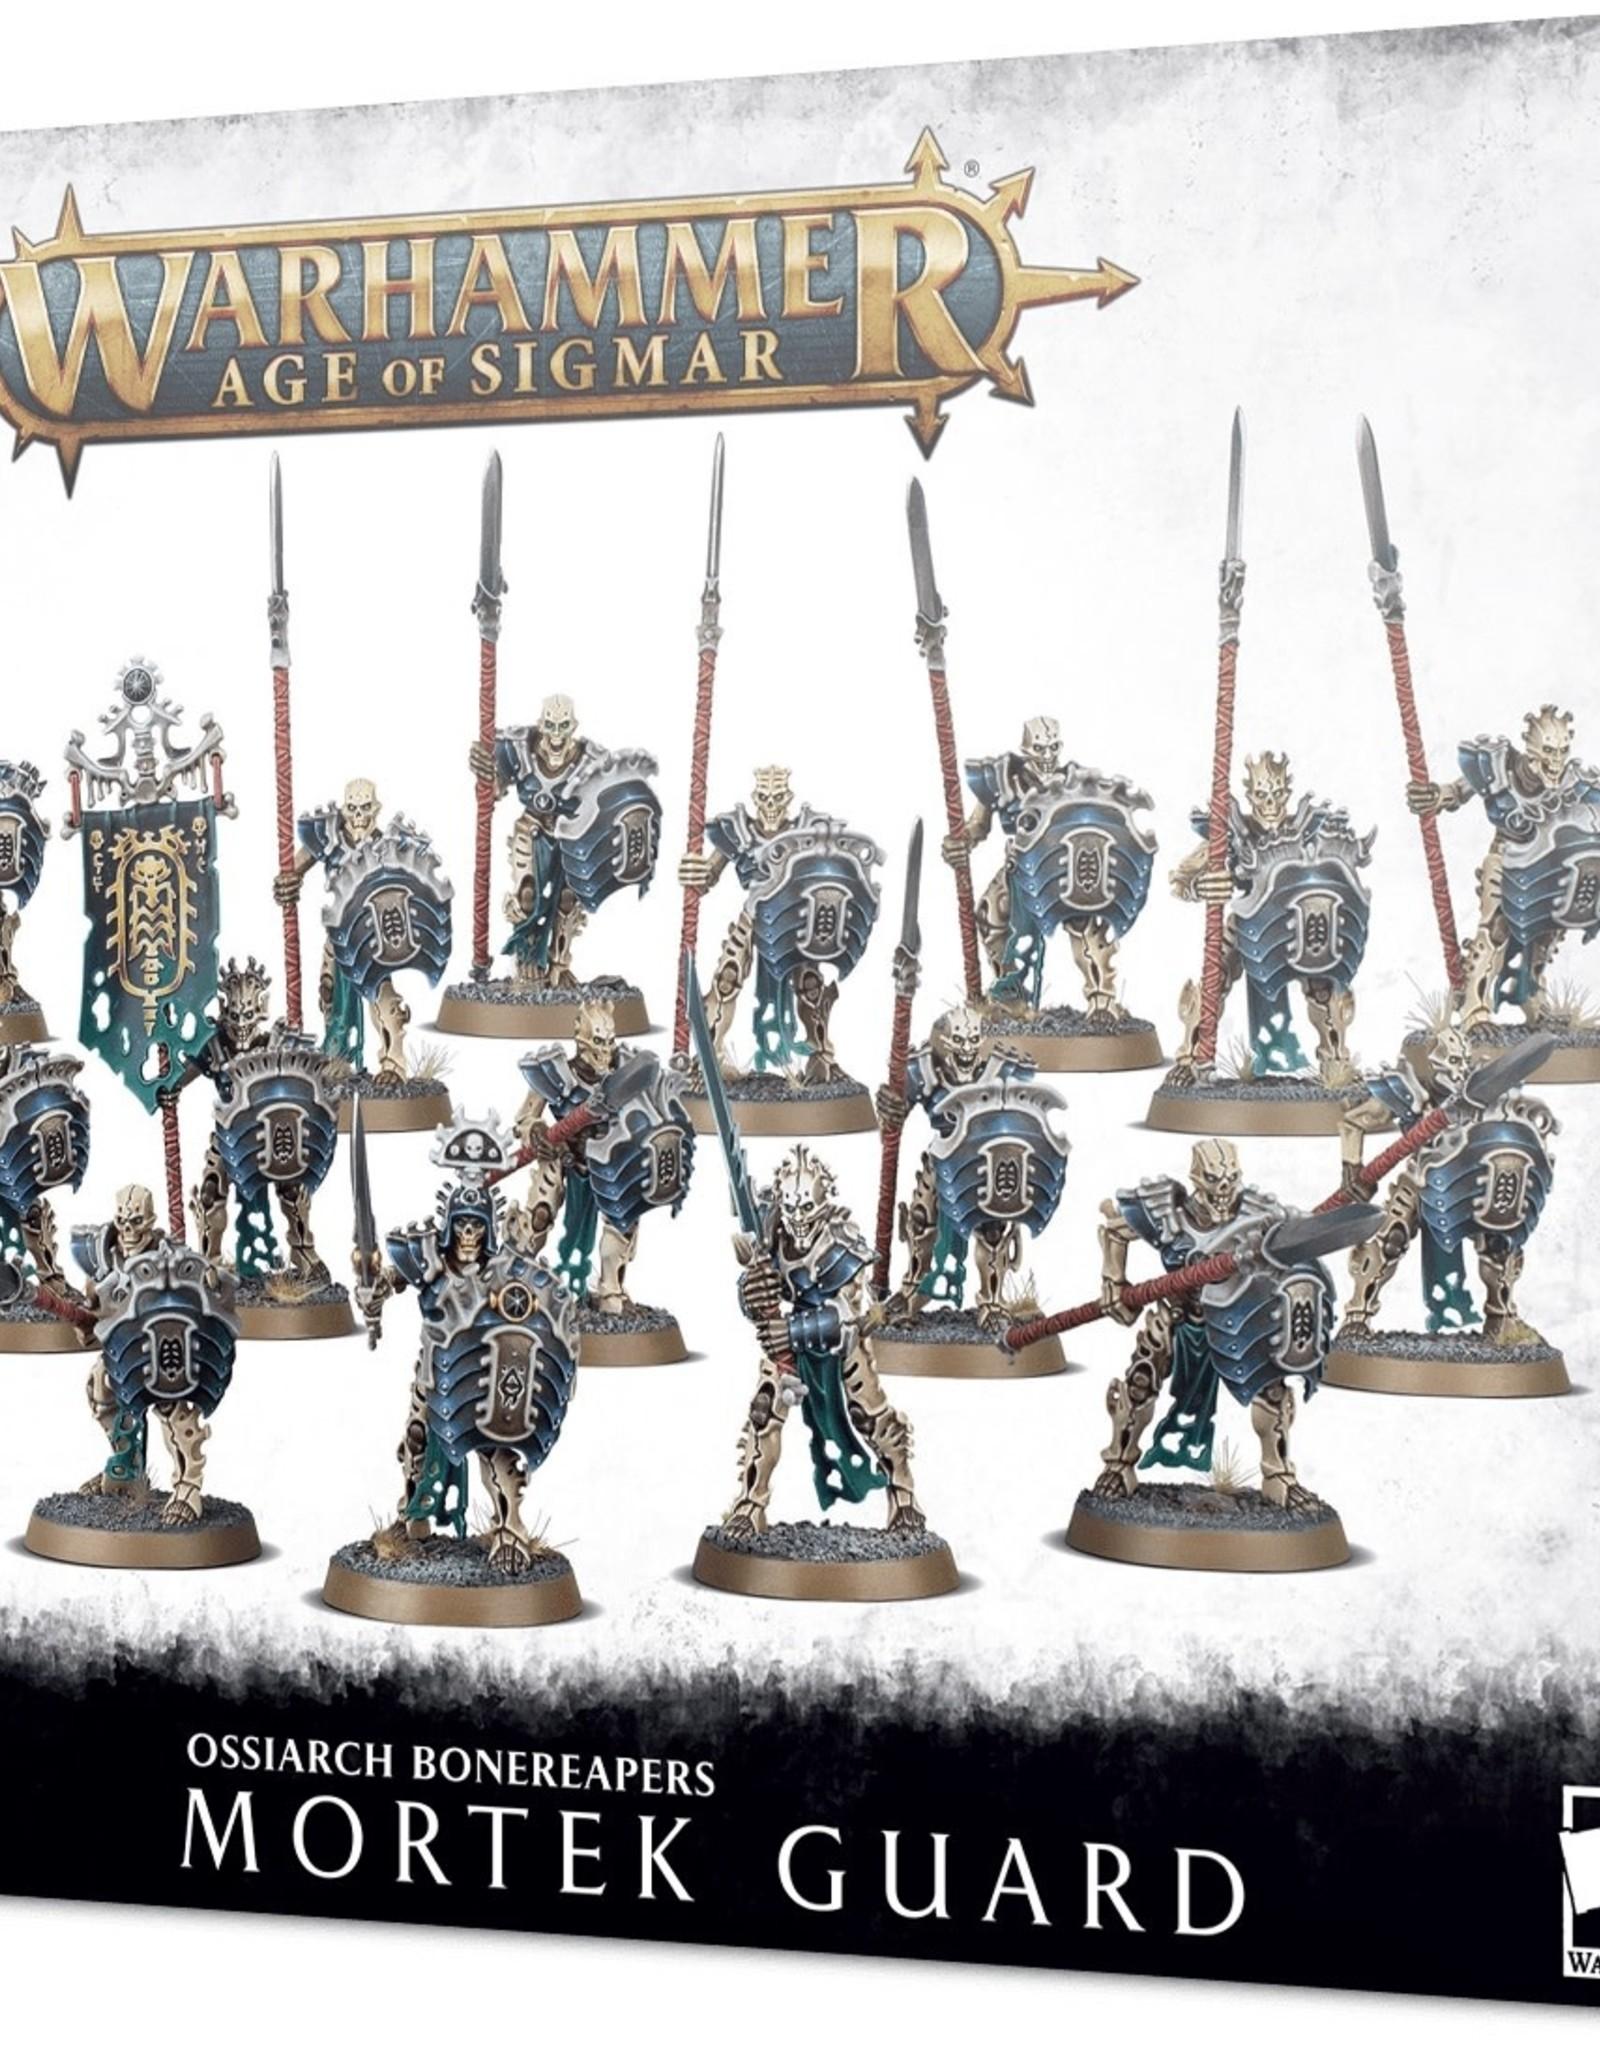 Games Workshop Warhammer Age of Sigmar: Ossiarch Bonereapers Mortek Guard